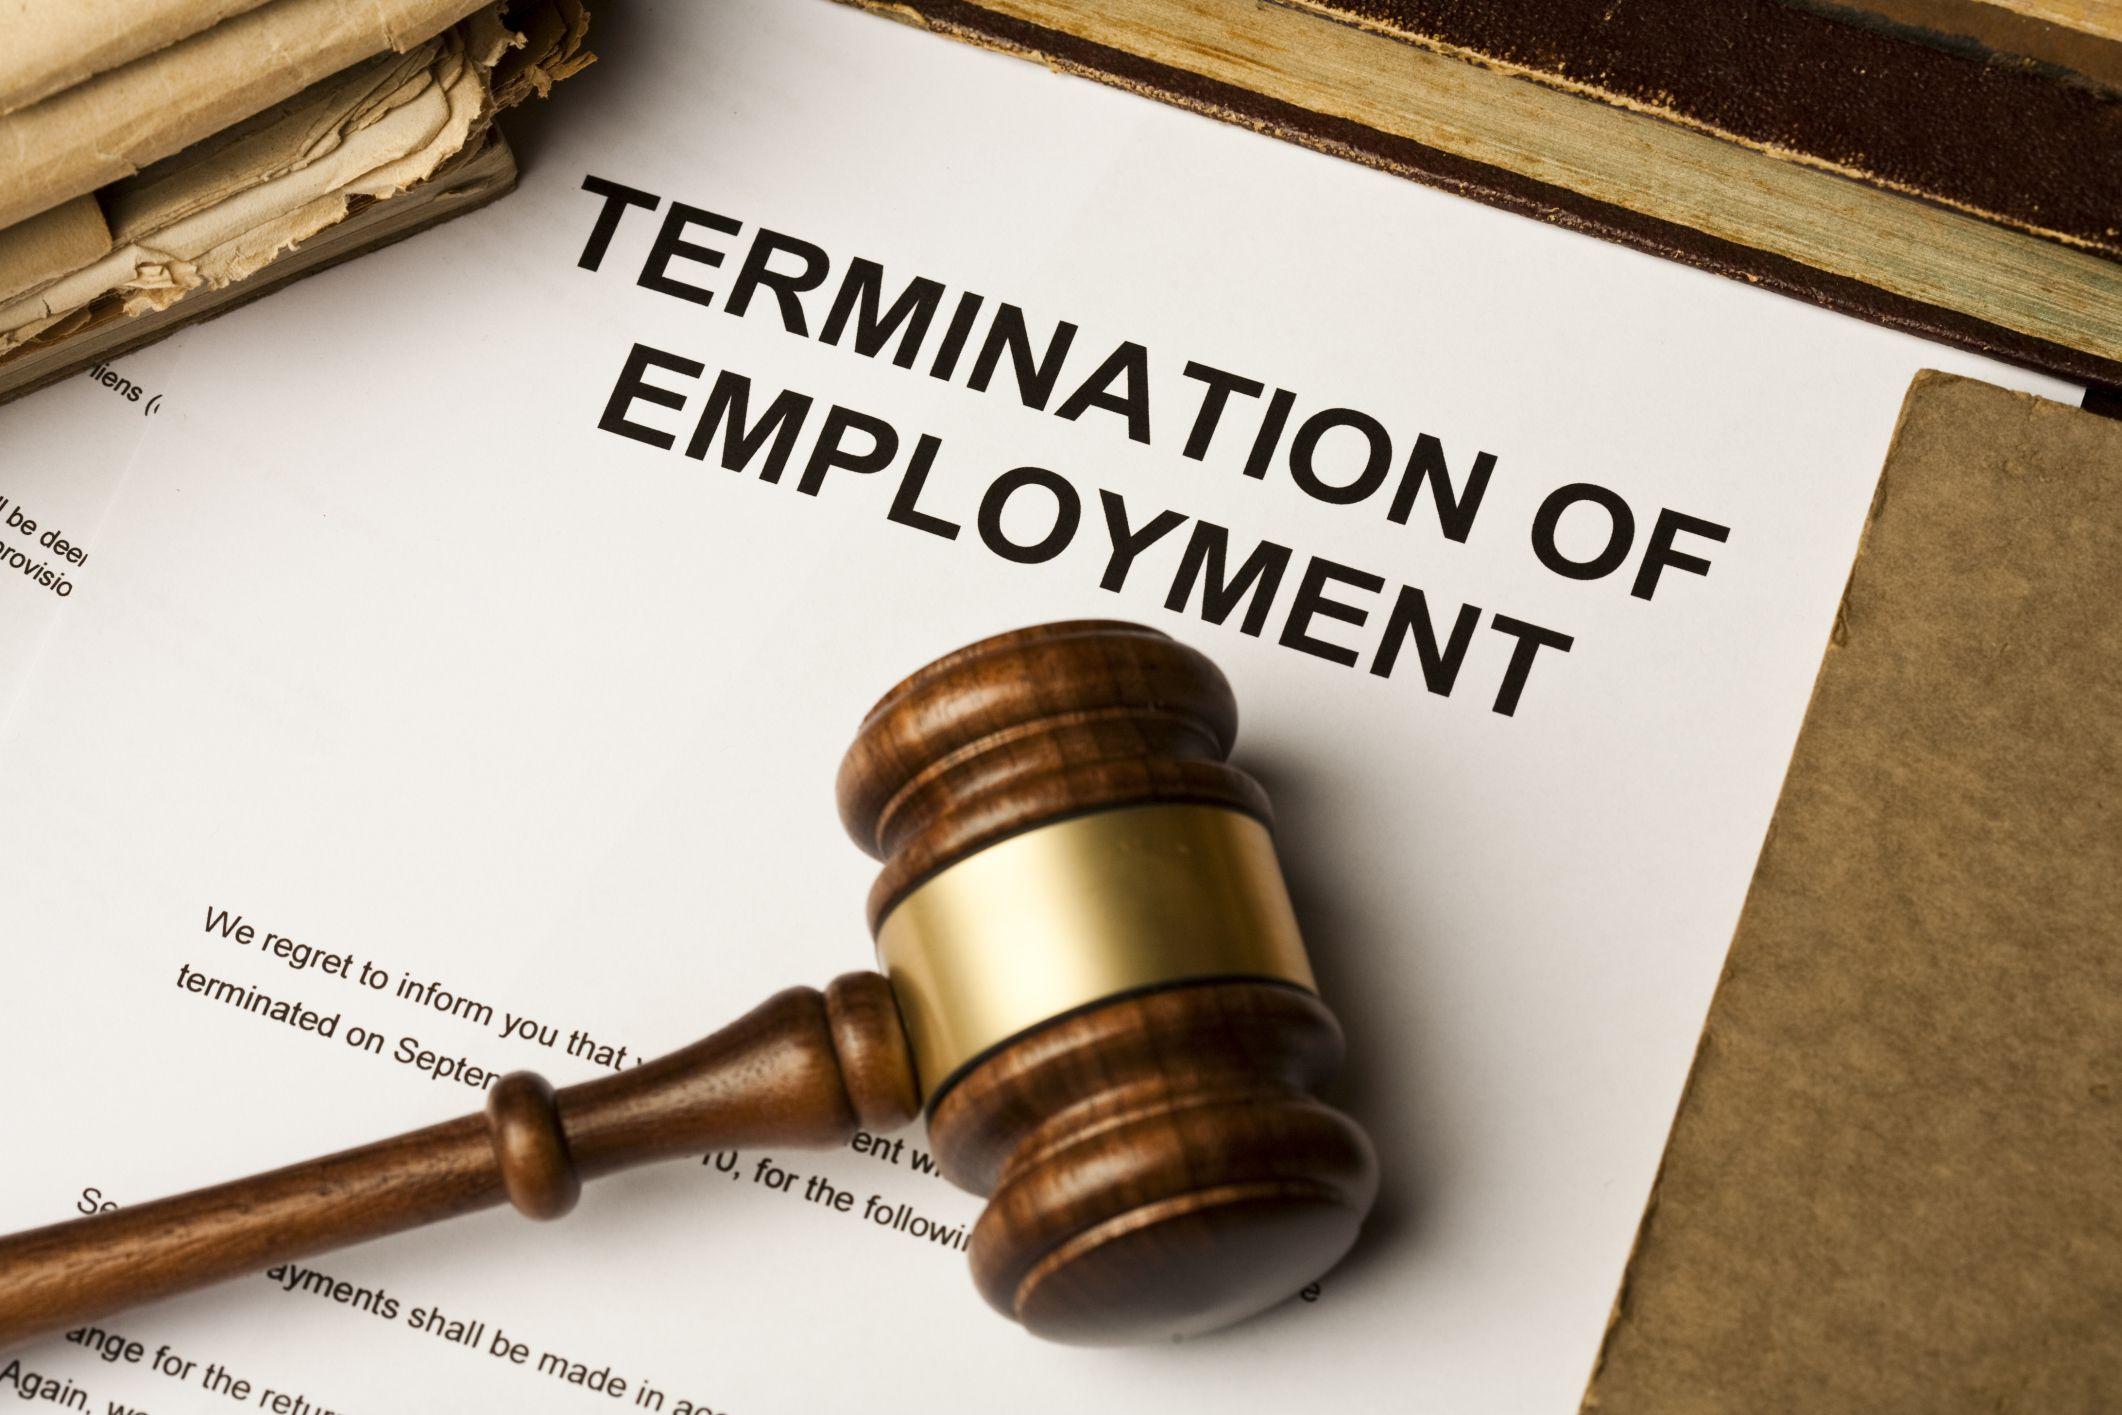 Lack Of Due Process: Fair Or Unfair Termination?